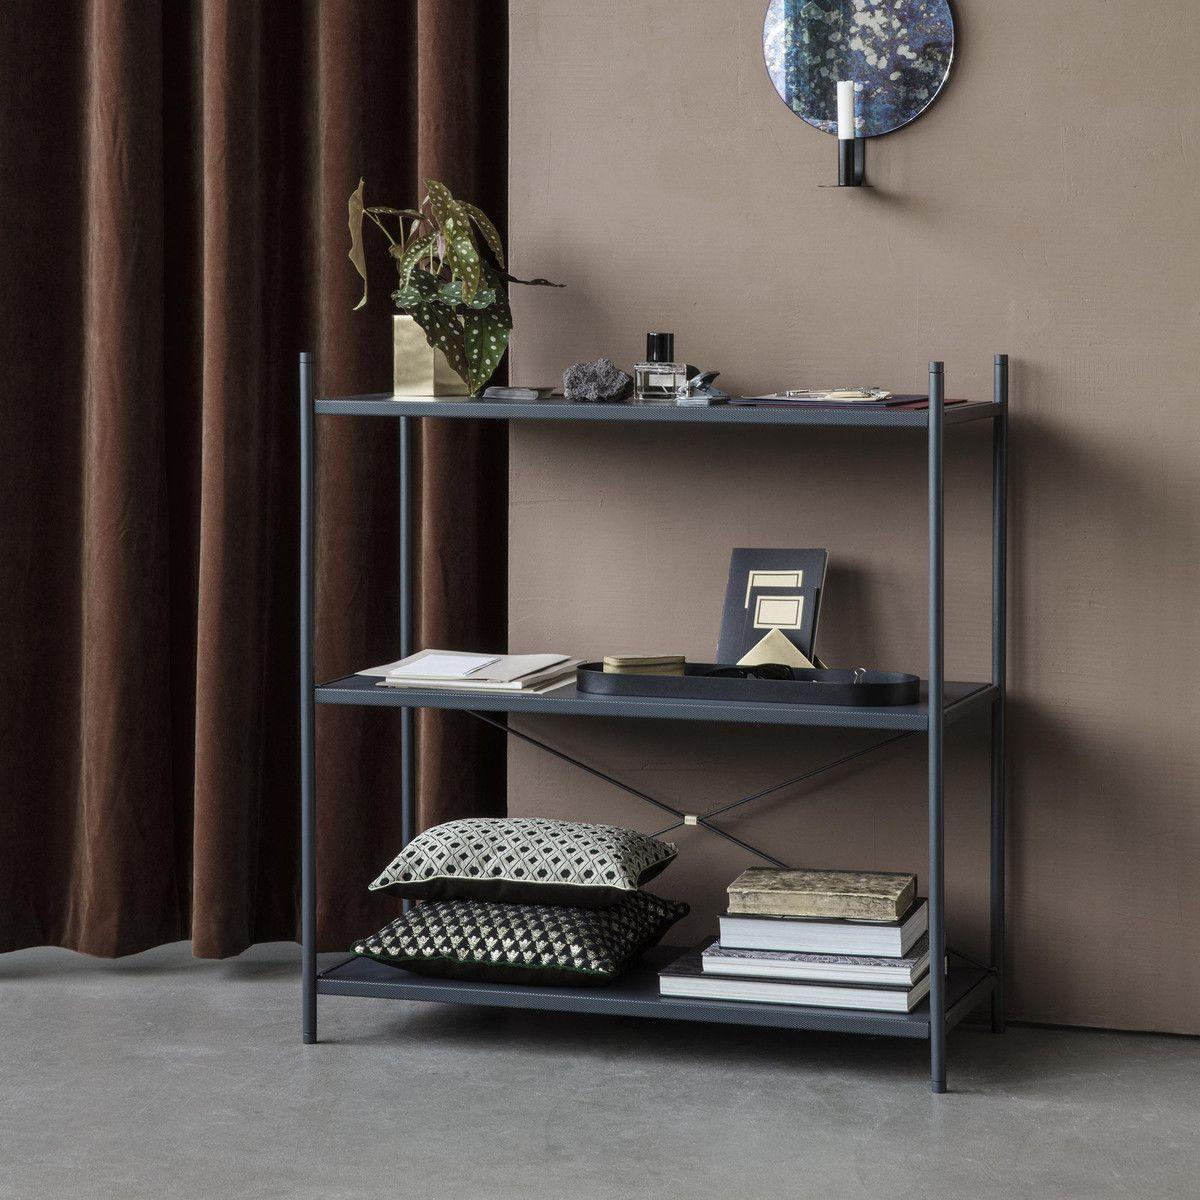 salon kissen fly 40x40cm ferm living. Black Bedroom Furniture Sets. Home Design Ideas